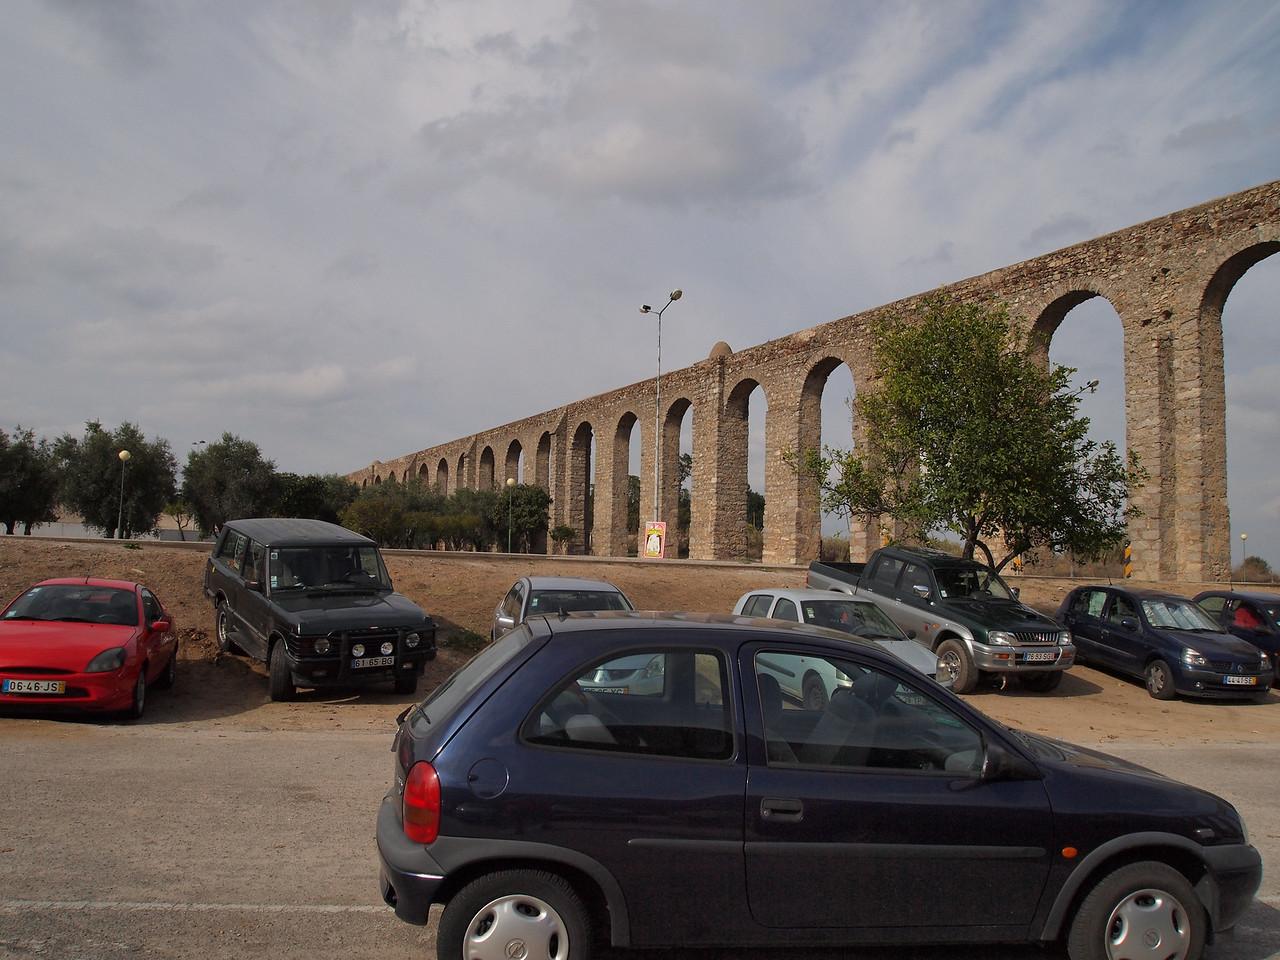 Roman Aquaduct - Evora, Portugal